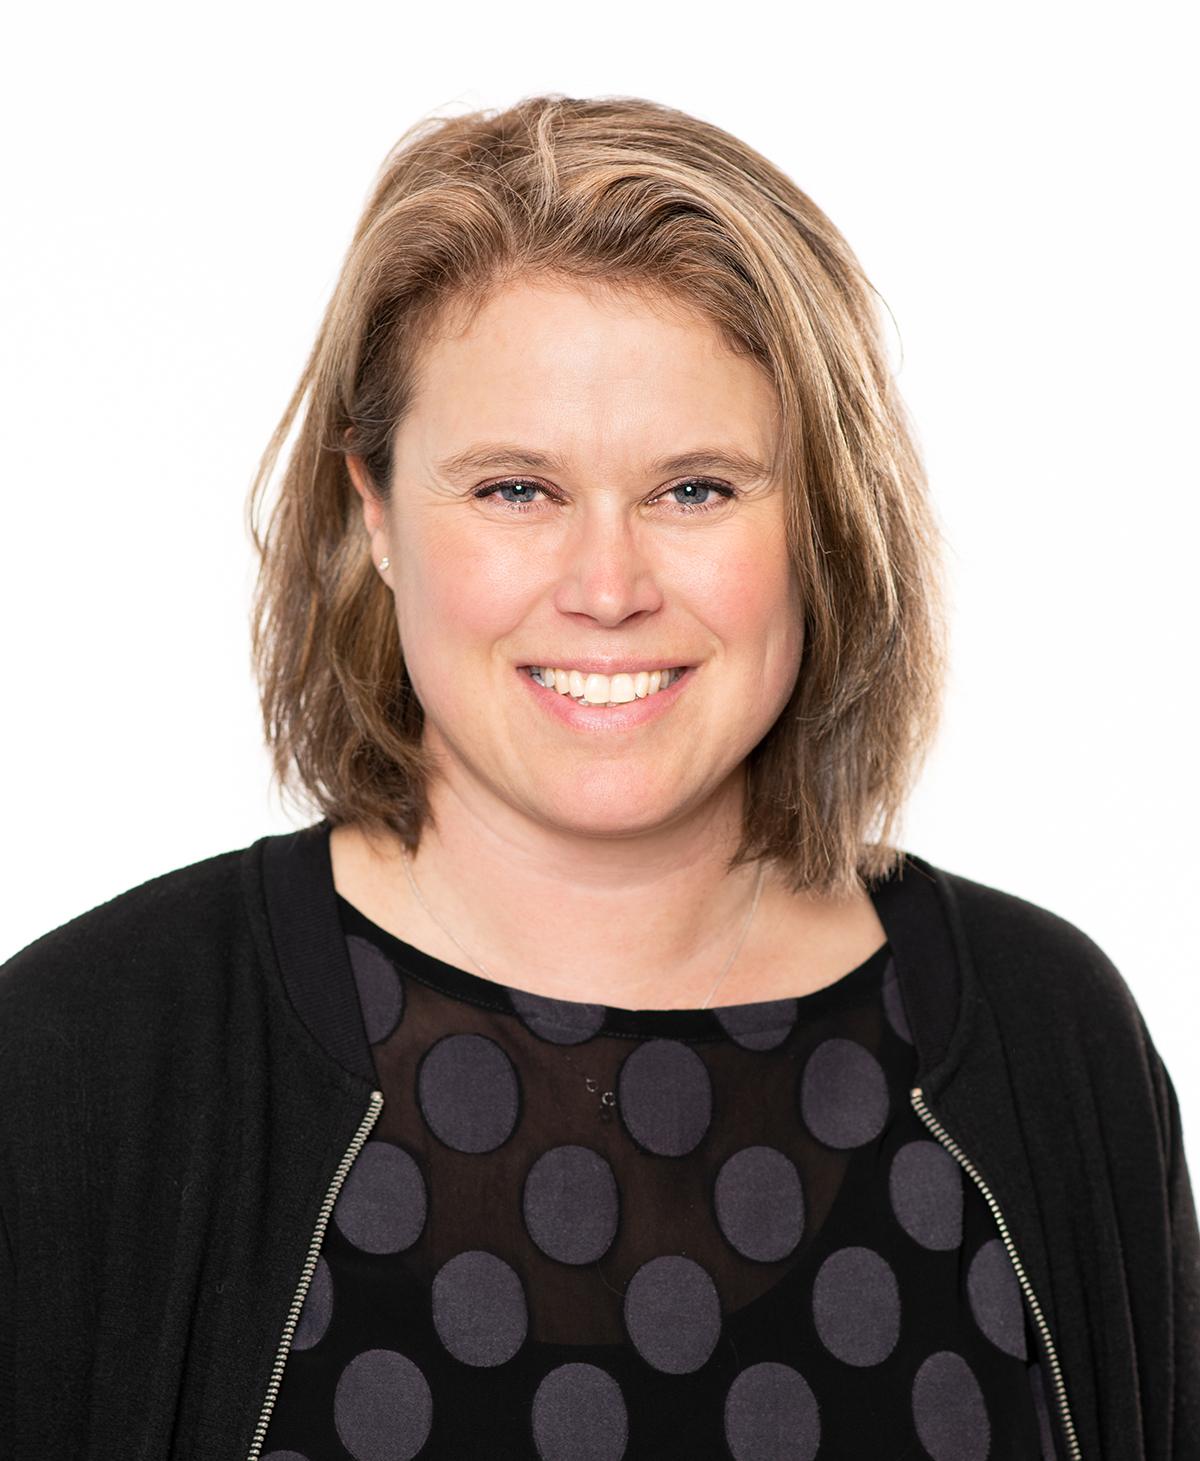 Management team: Dr Pernilla Abrahamsson